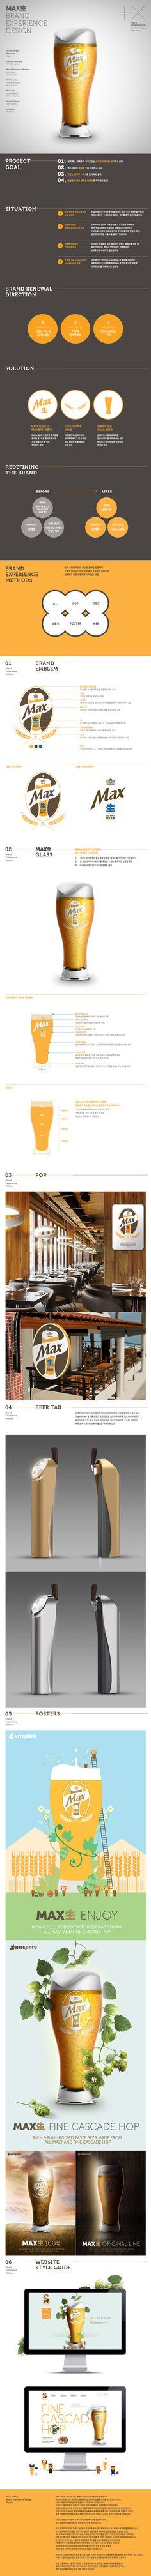 HITE MAX生 Brand Experience Design on Behance